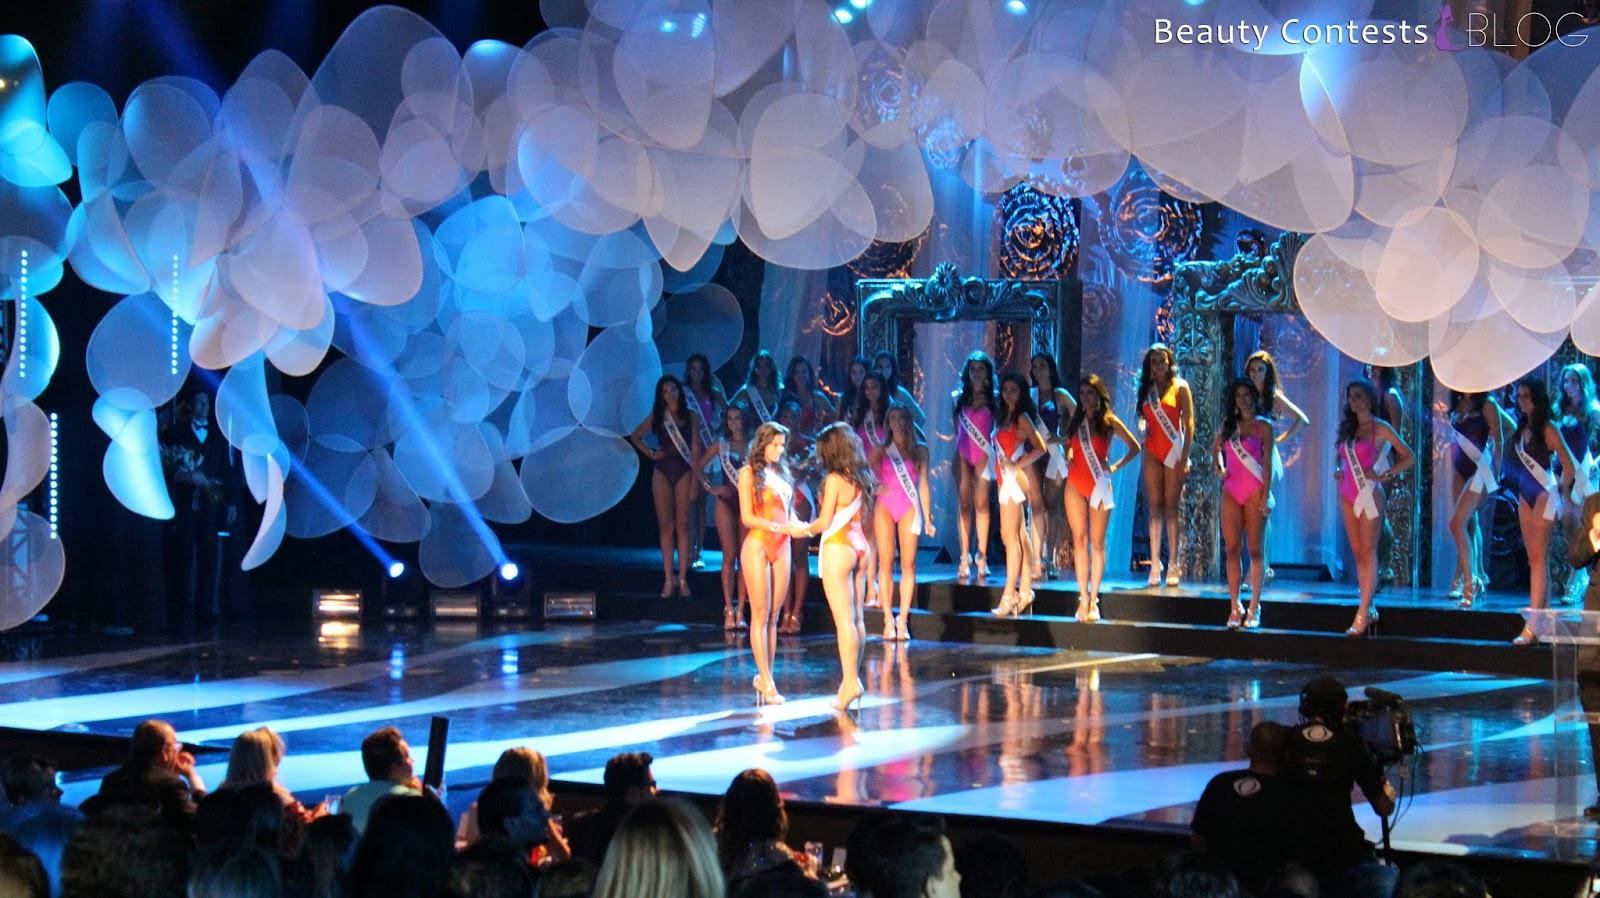 miss-brasil-2013-fotos-miss-universe-brazil-2013-BEAUTY-CONTESTS-BLOG ...